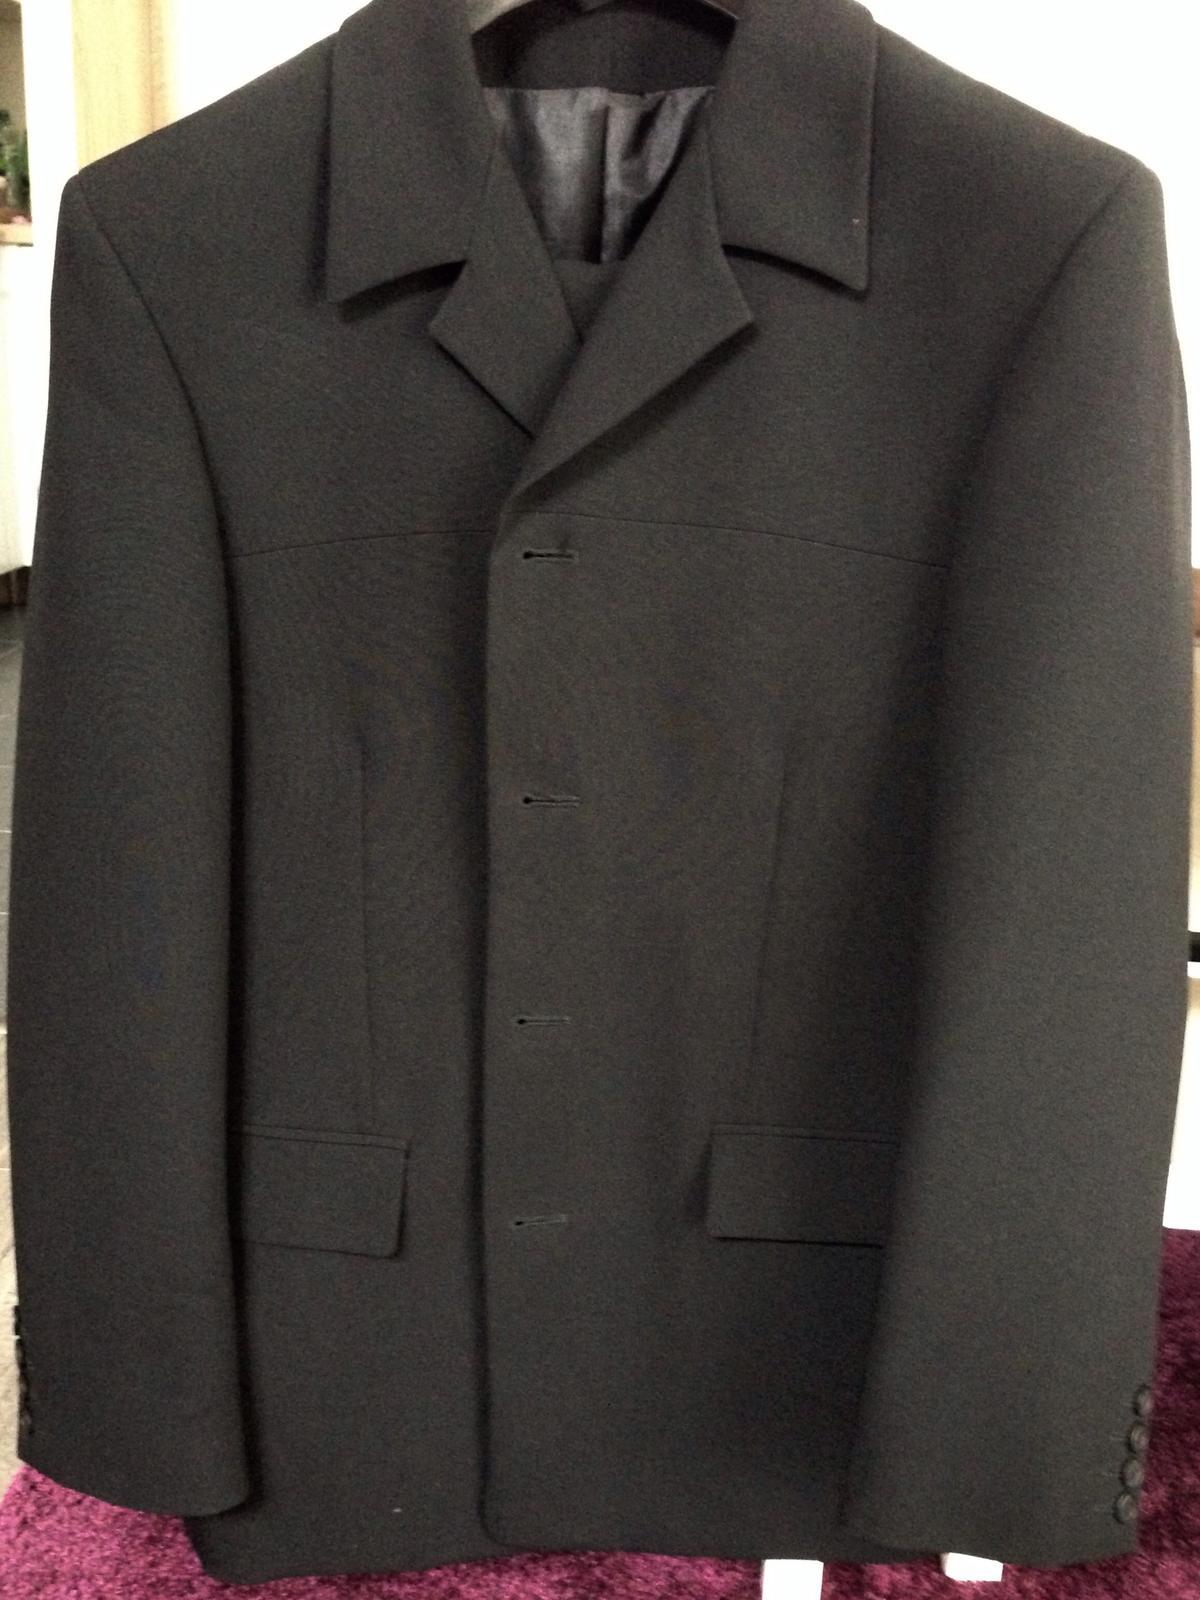 Oblek zn. Jamel - Obrázok č. 1